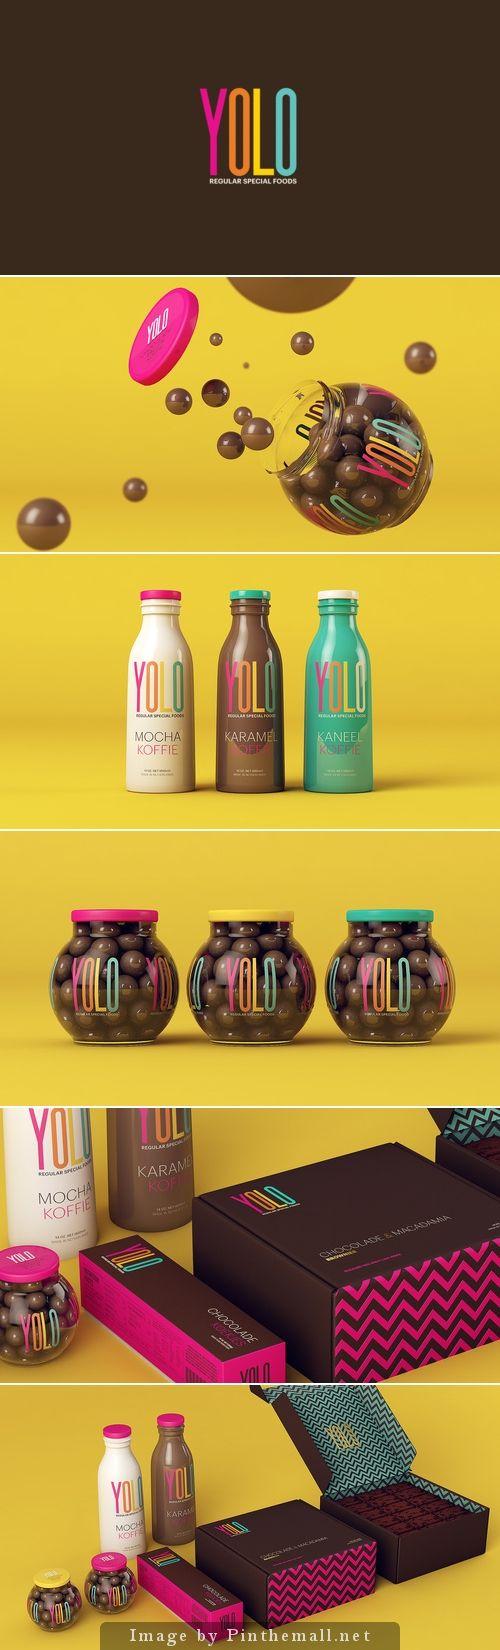 Yolo |Designed by Sweety Branding Studio | Designer: Isabela Rodrigues | Country: Brazil http://us1.campaign-archive1.com/?u=464a6932b4468bf2530f8de19&id=a05e0552d1&e=2cce848c9a